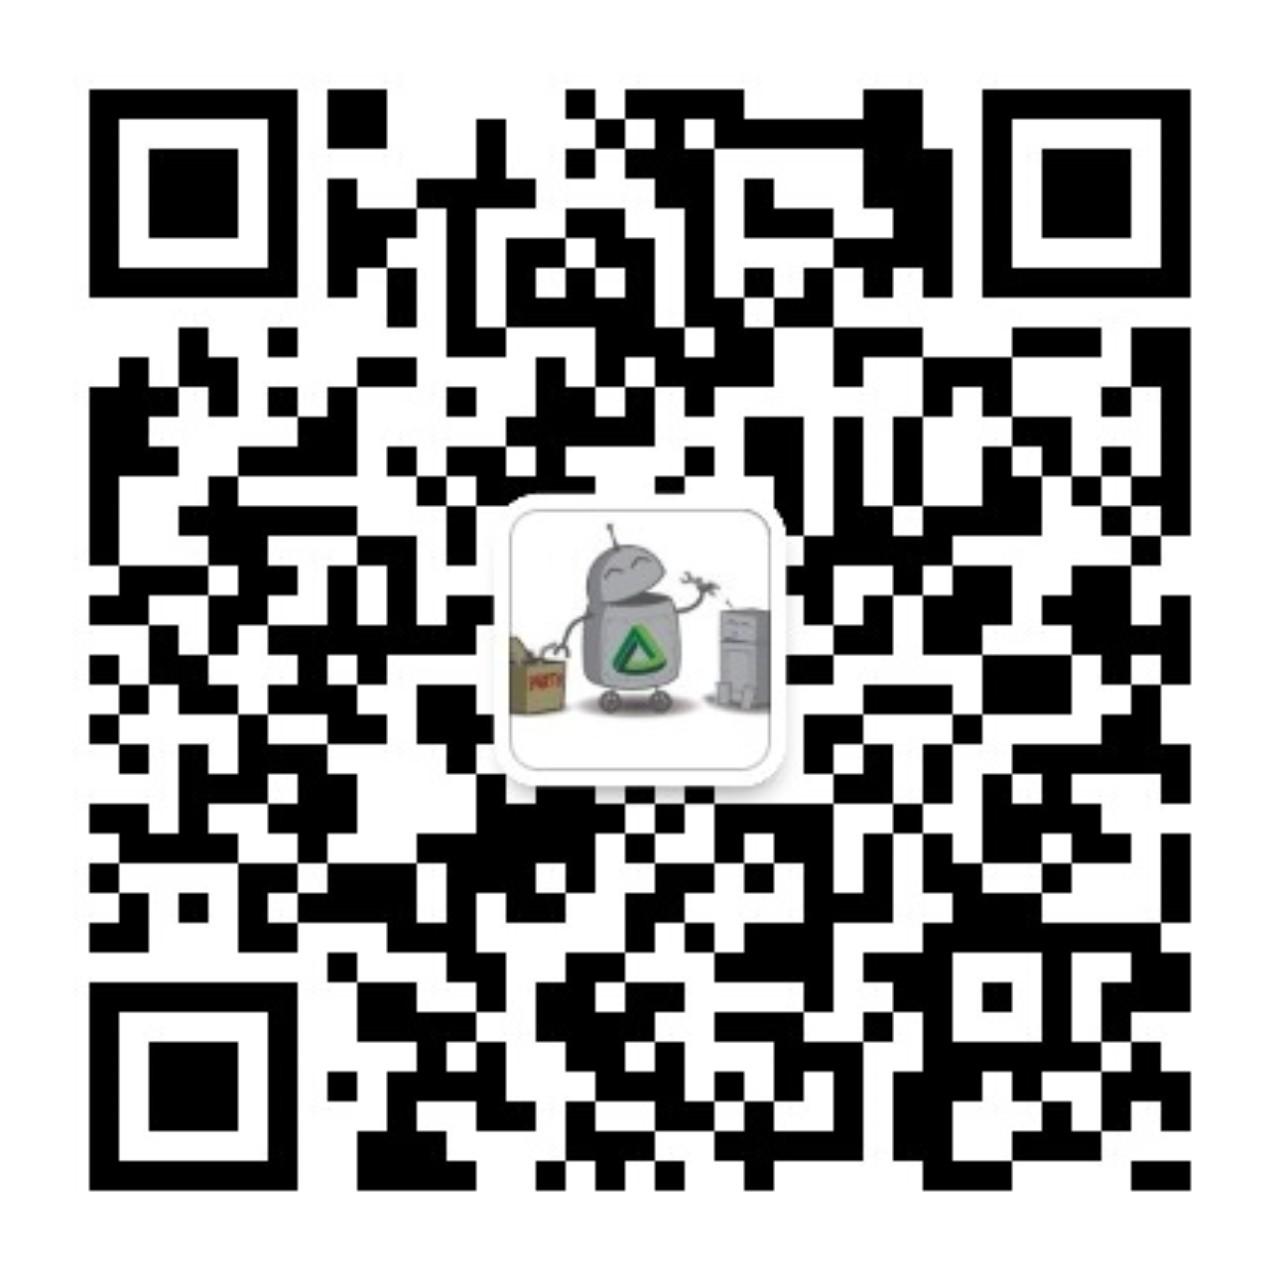 image_20200228_ccc426ebdf9d2.jpg